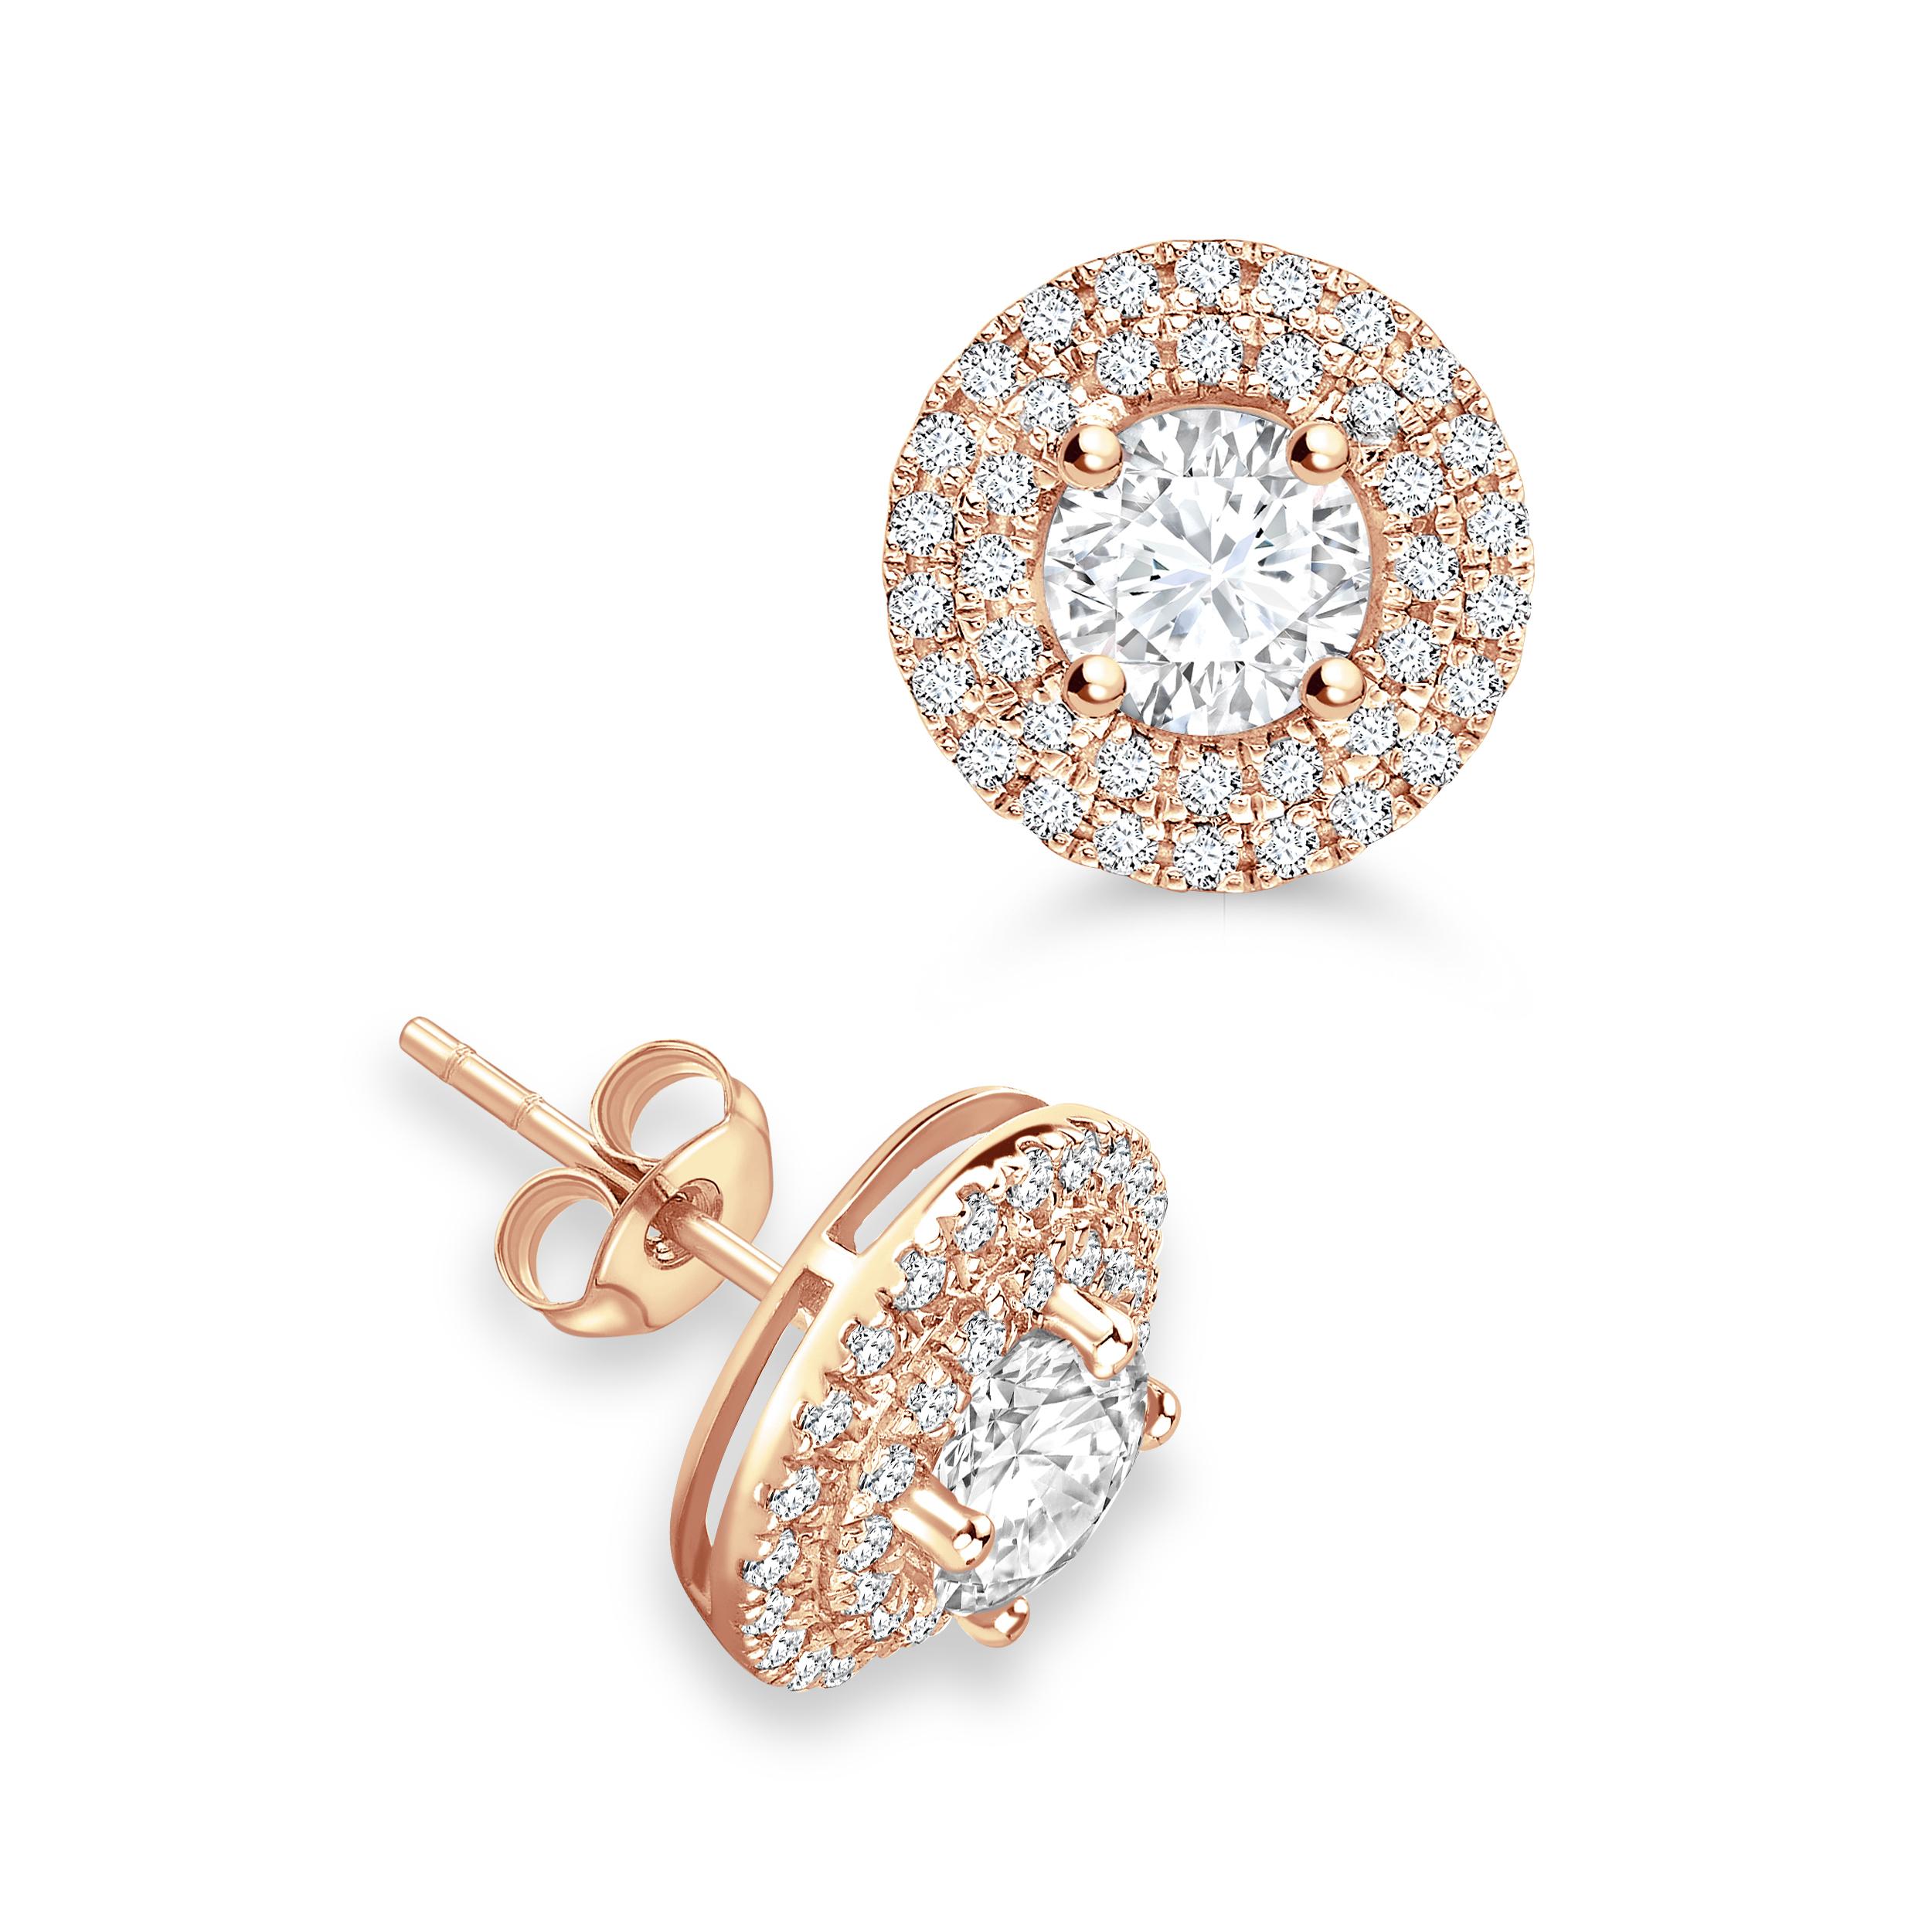 Round Two Raw Circlet Stud Diamond Halo Earrings